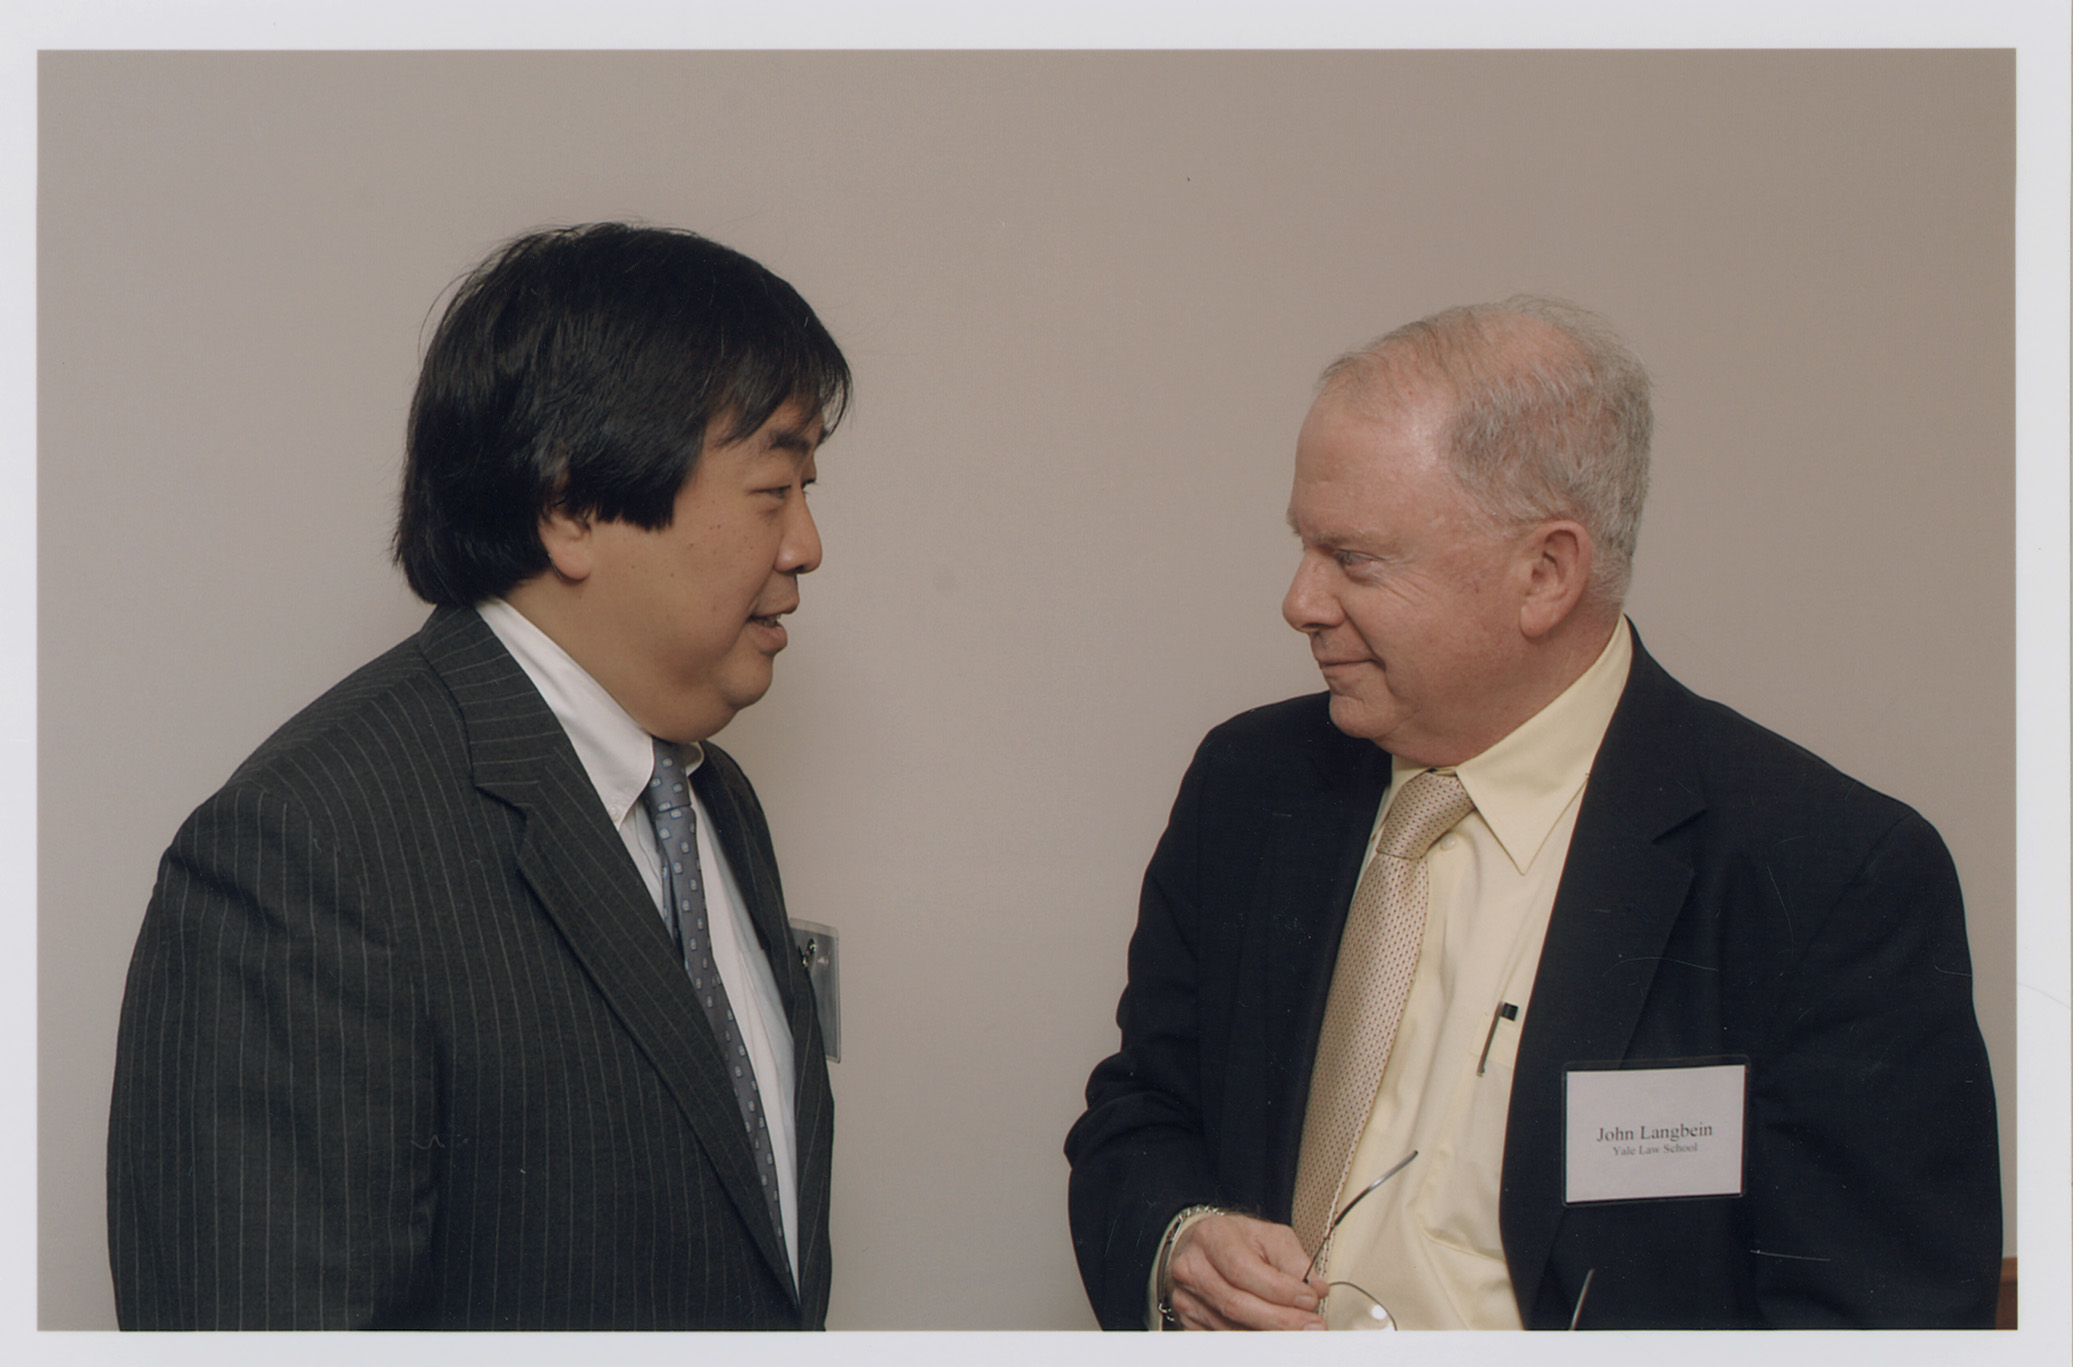 YLS Dean Harold Hongju Koh and YLS Prof. John Langbein